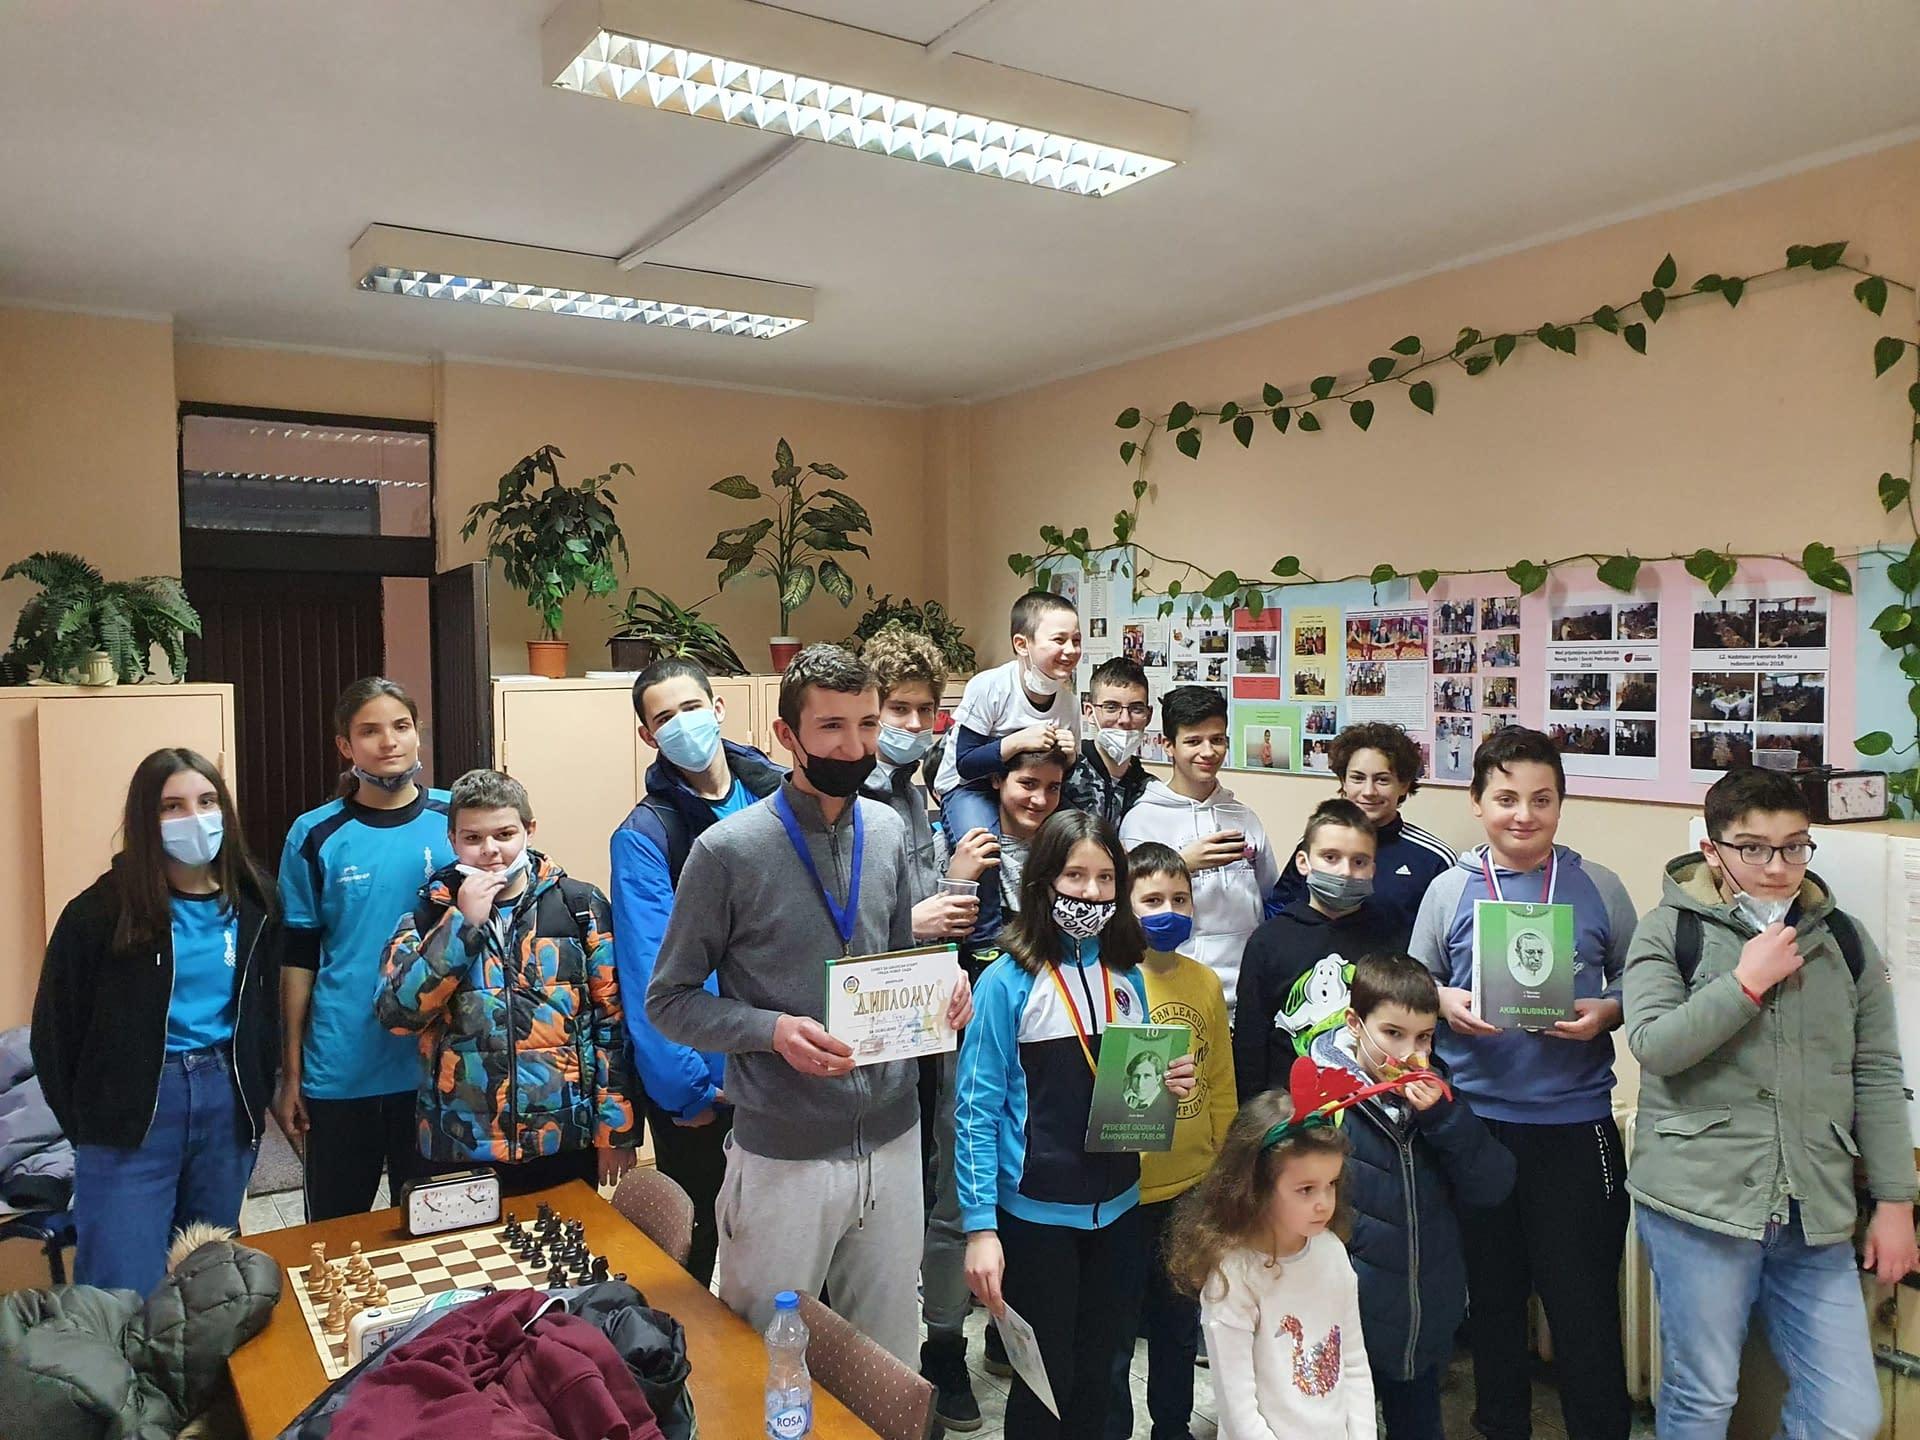 Organizovan turnir sa prijateljima iz beogradskih klubova ŠK Kralj i ŠK Vidikovac – 31.01.2021.